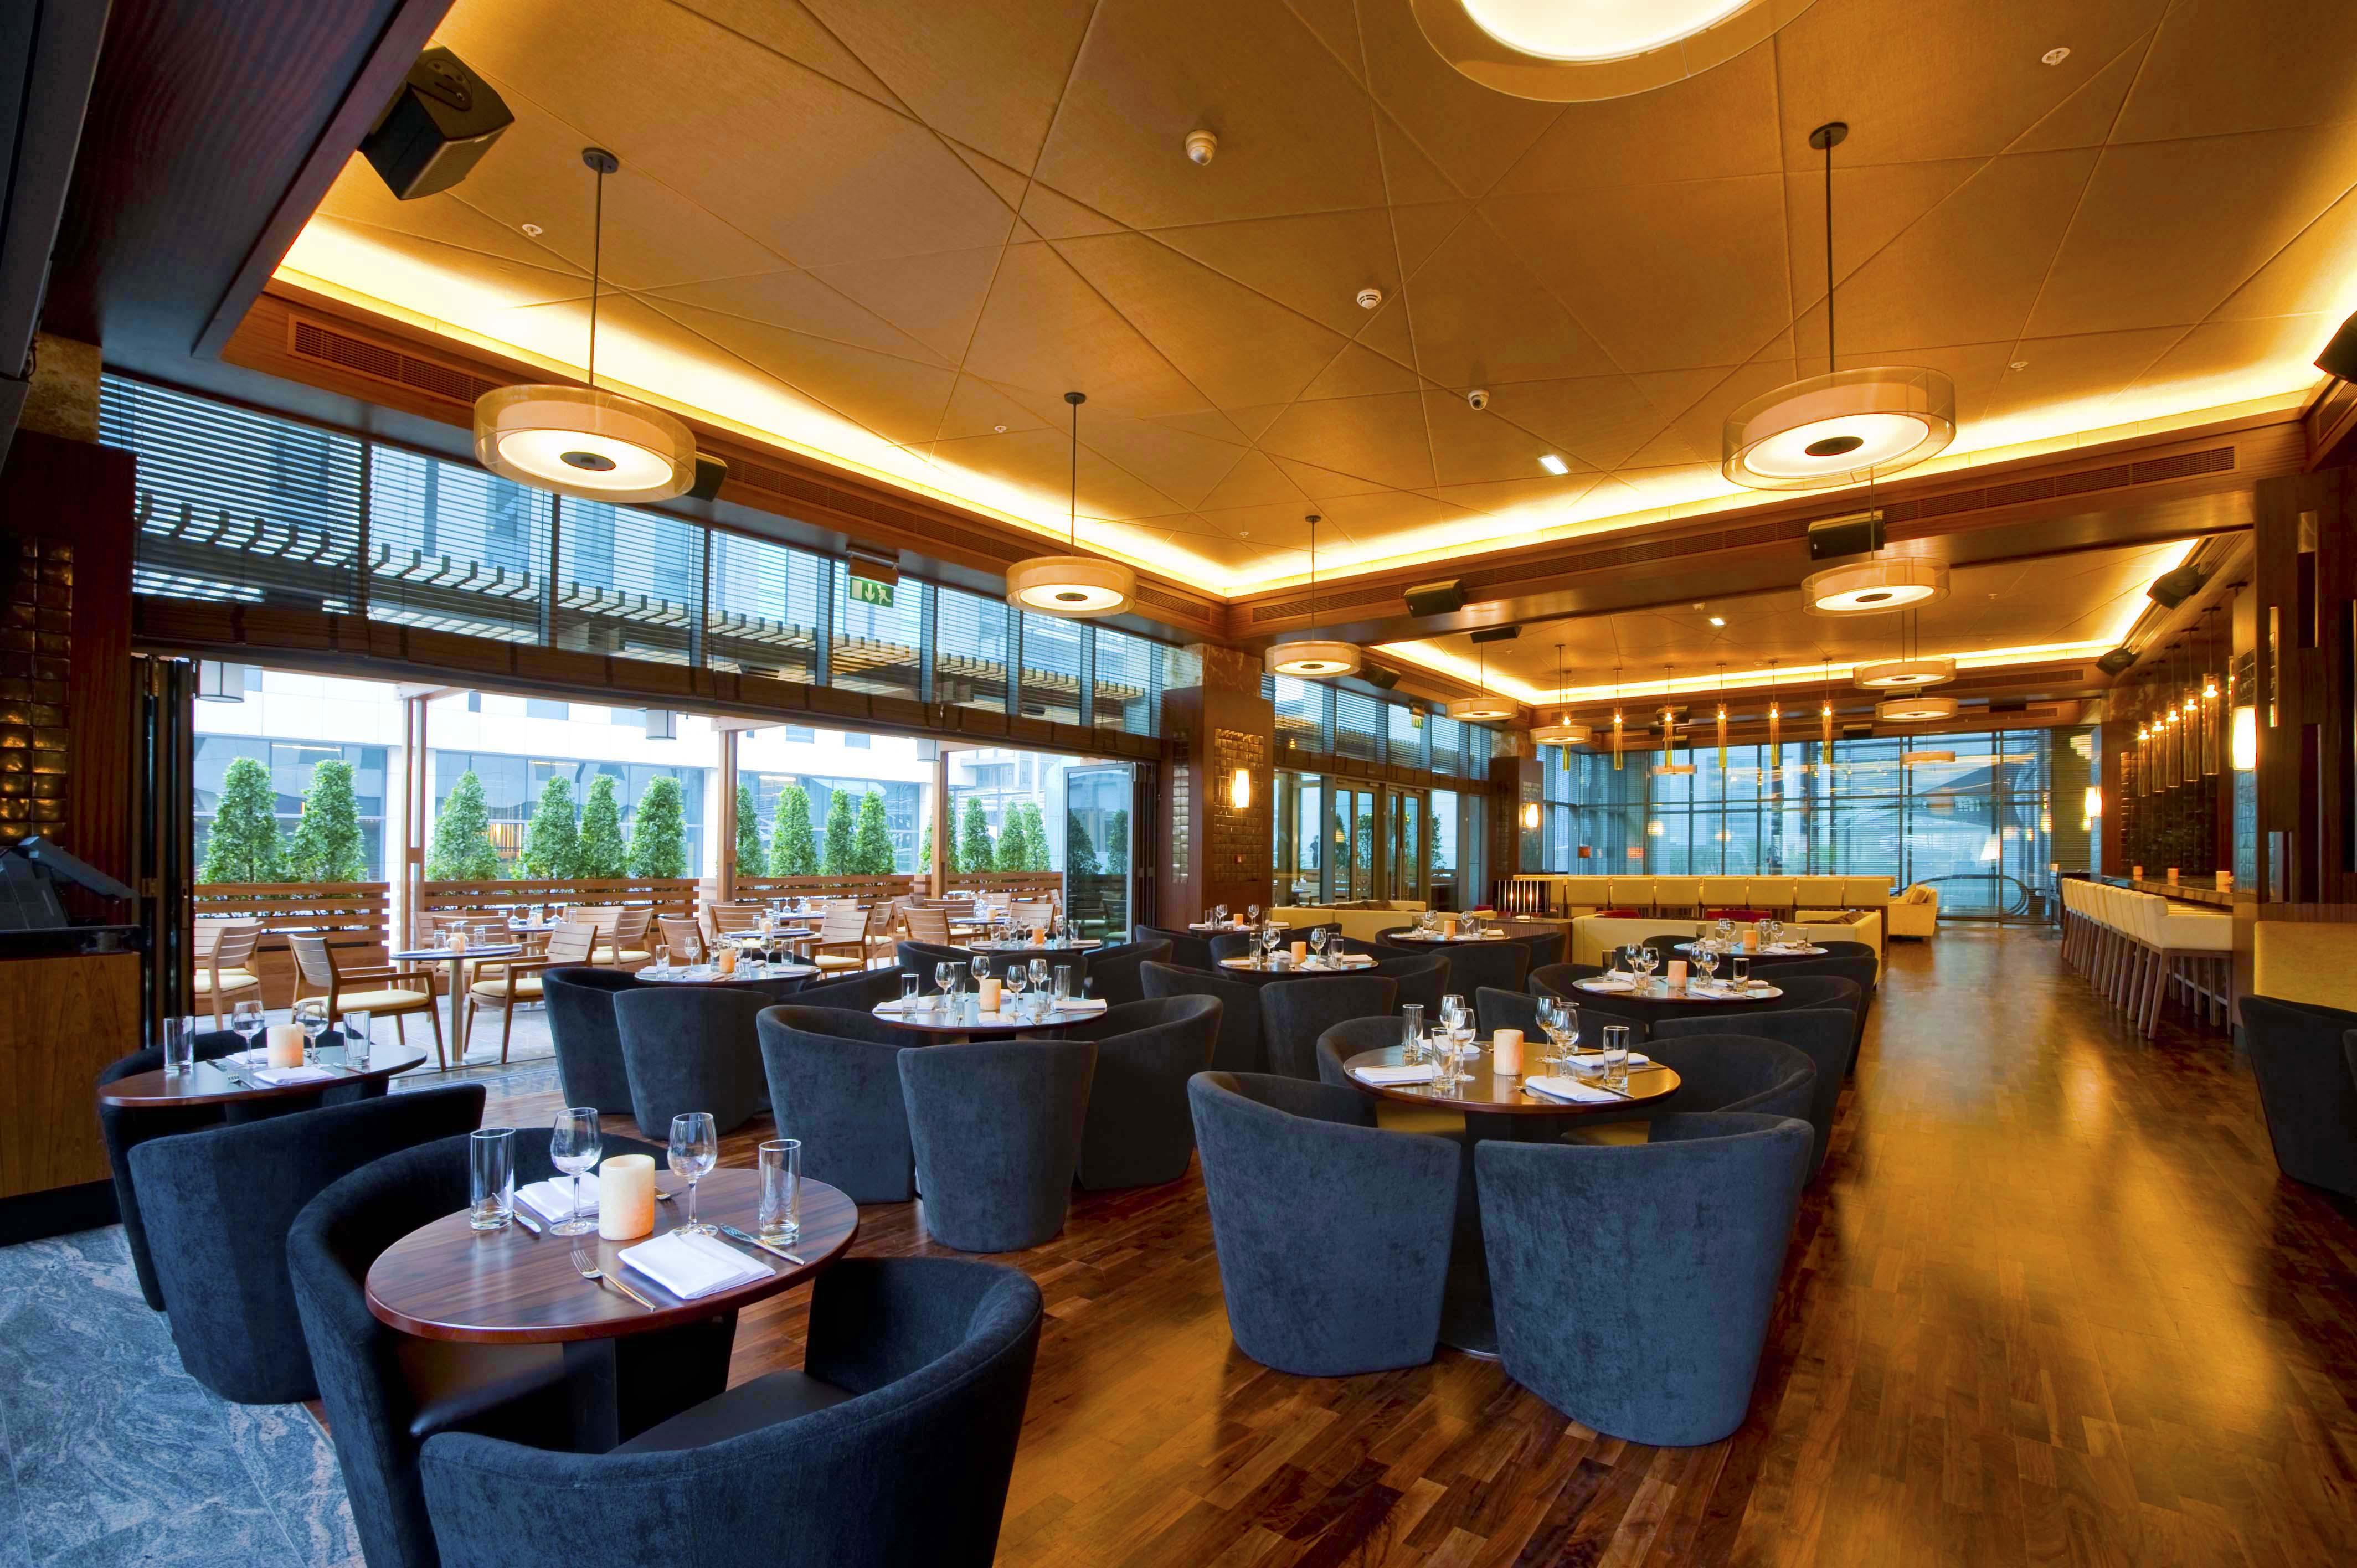 Caramel Restaurant & Lounge Interiors